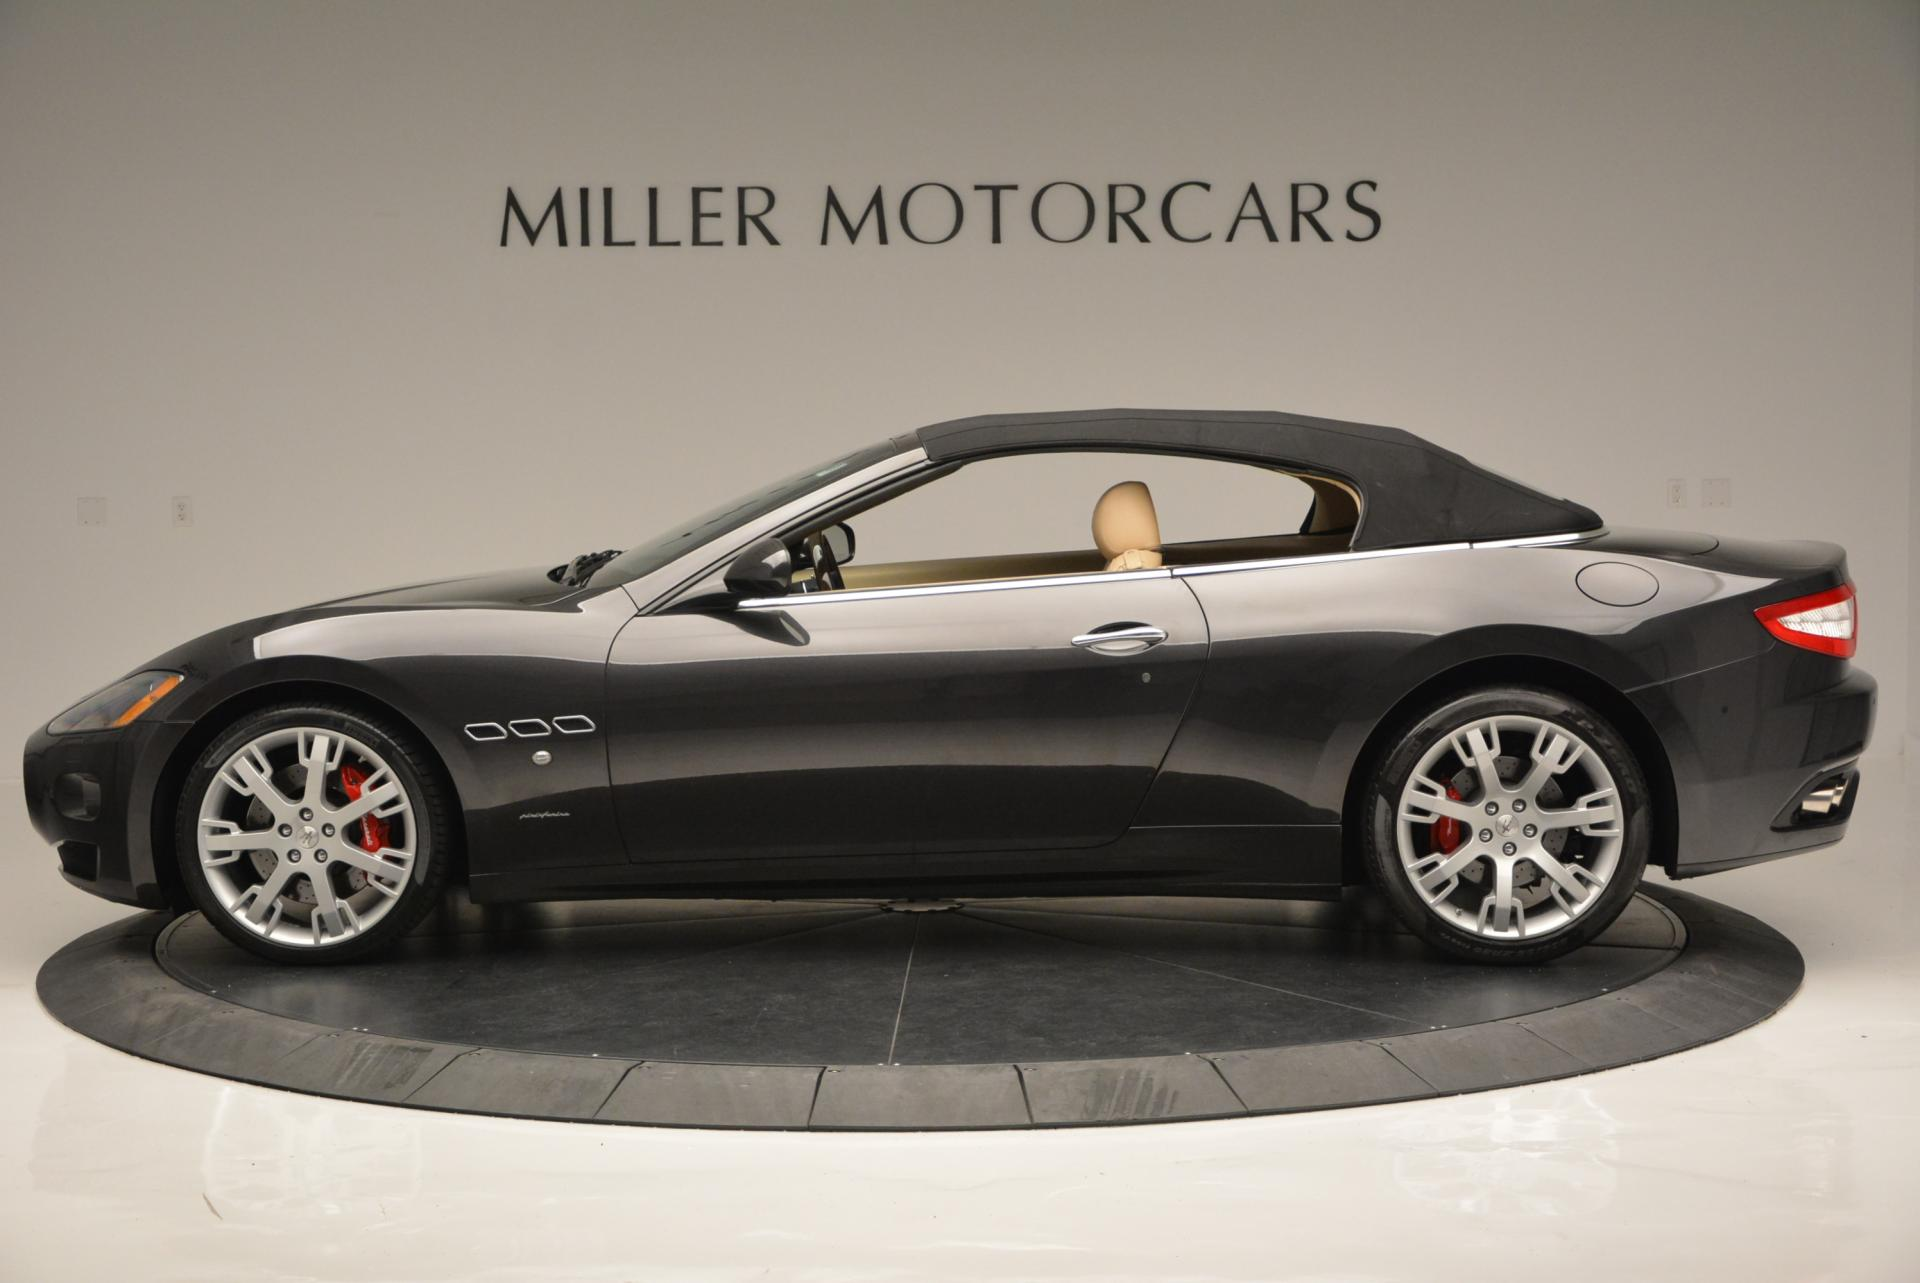 Used 2011 Maserati GranTurismo Base For Sale In Westport, CT 158_p15